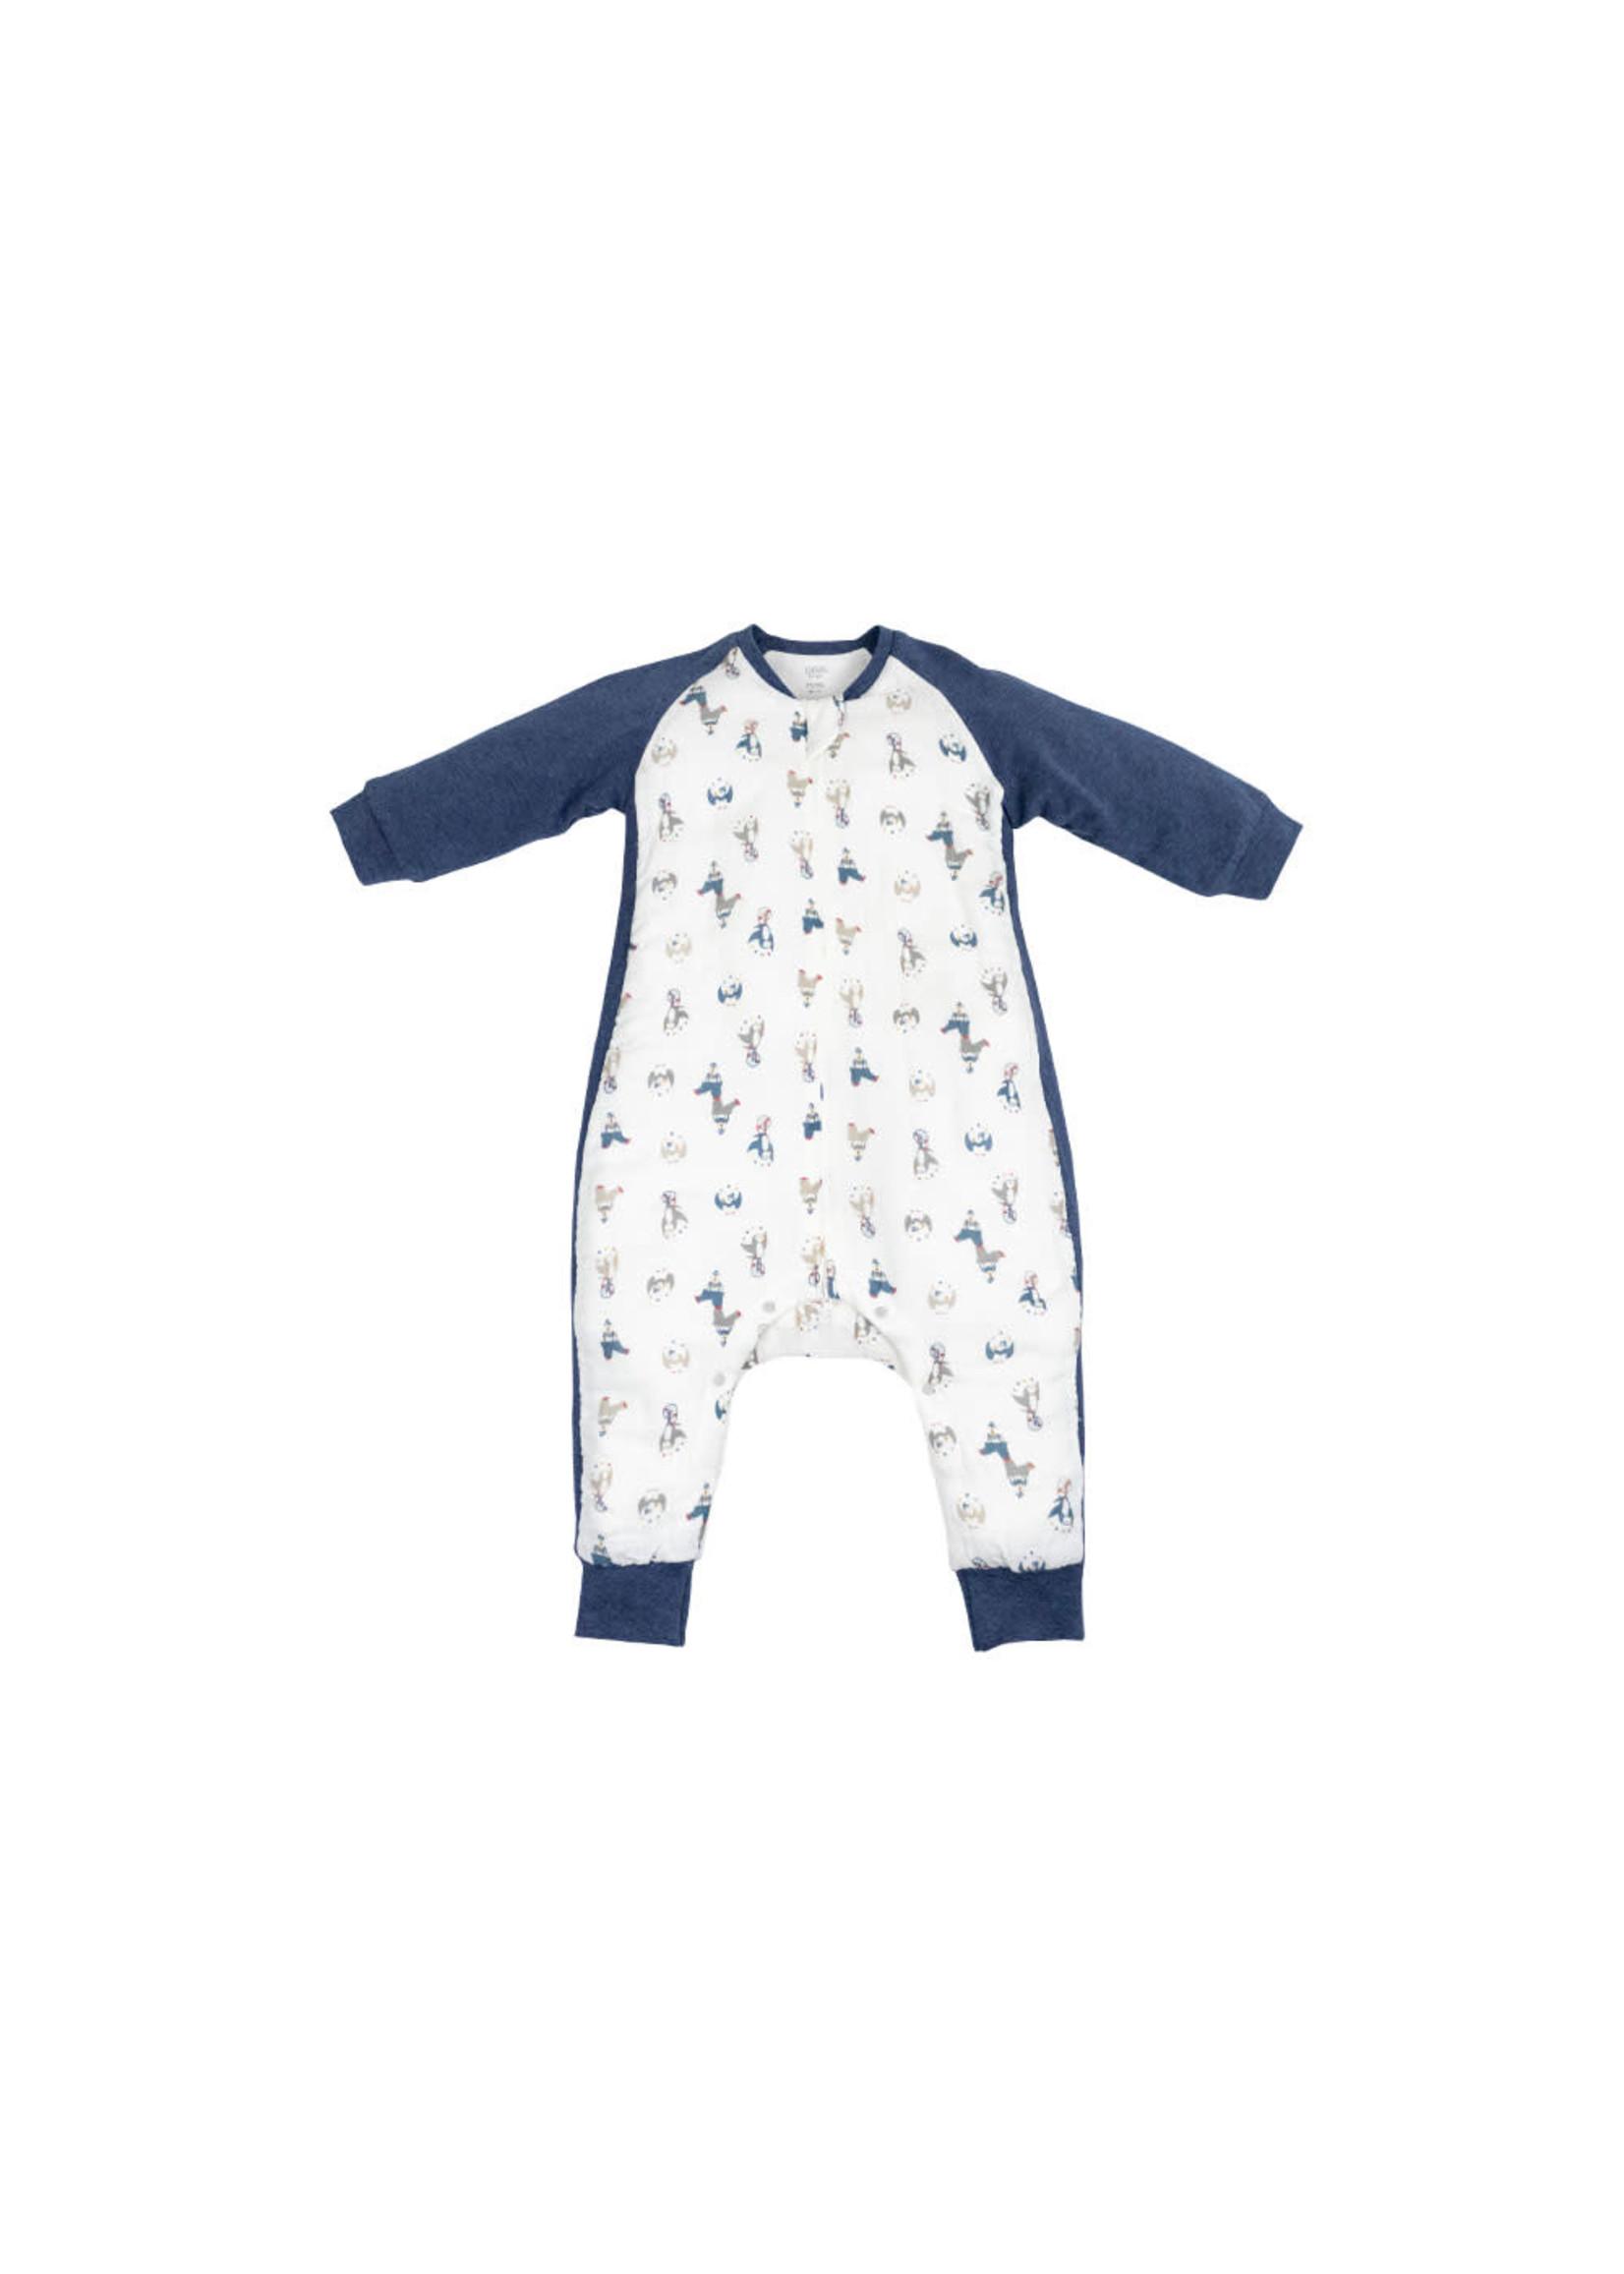 Nest Designs ND 2.5 Sleep Suit (Circus Puffin - Longsleeve)